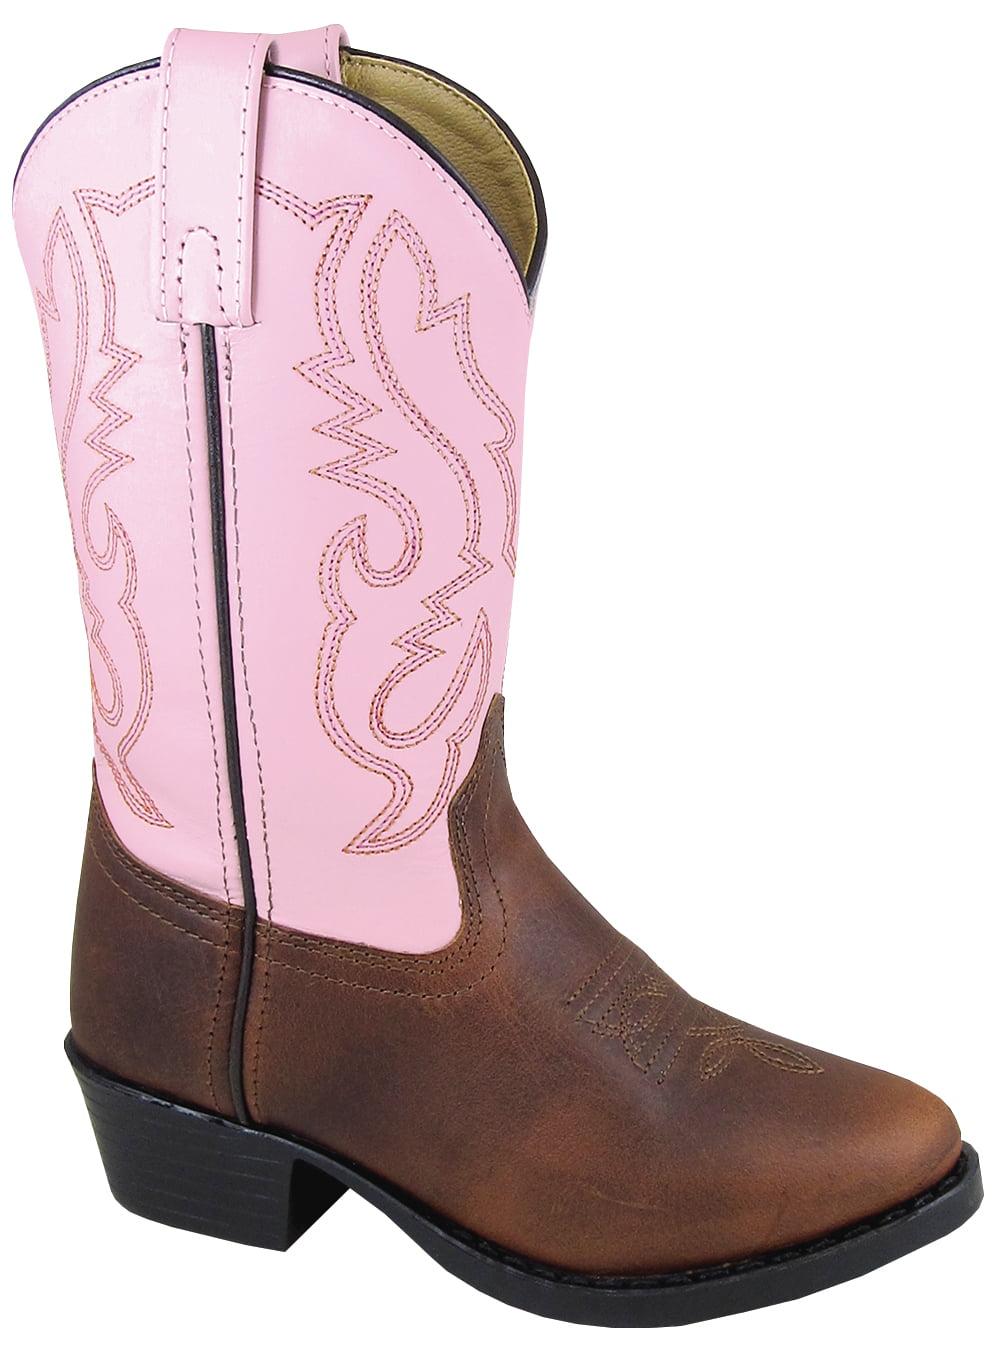 Kid's Denver Brown Pink Leather Cowboy